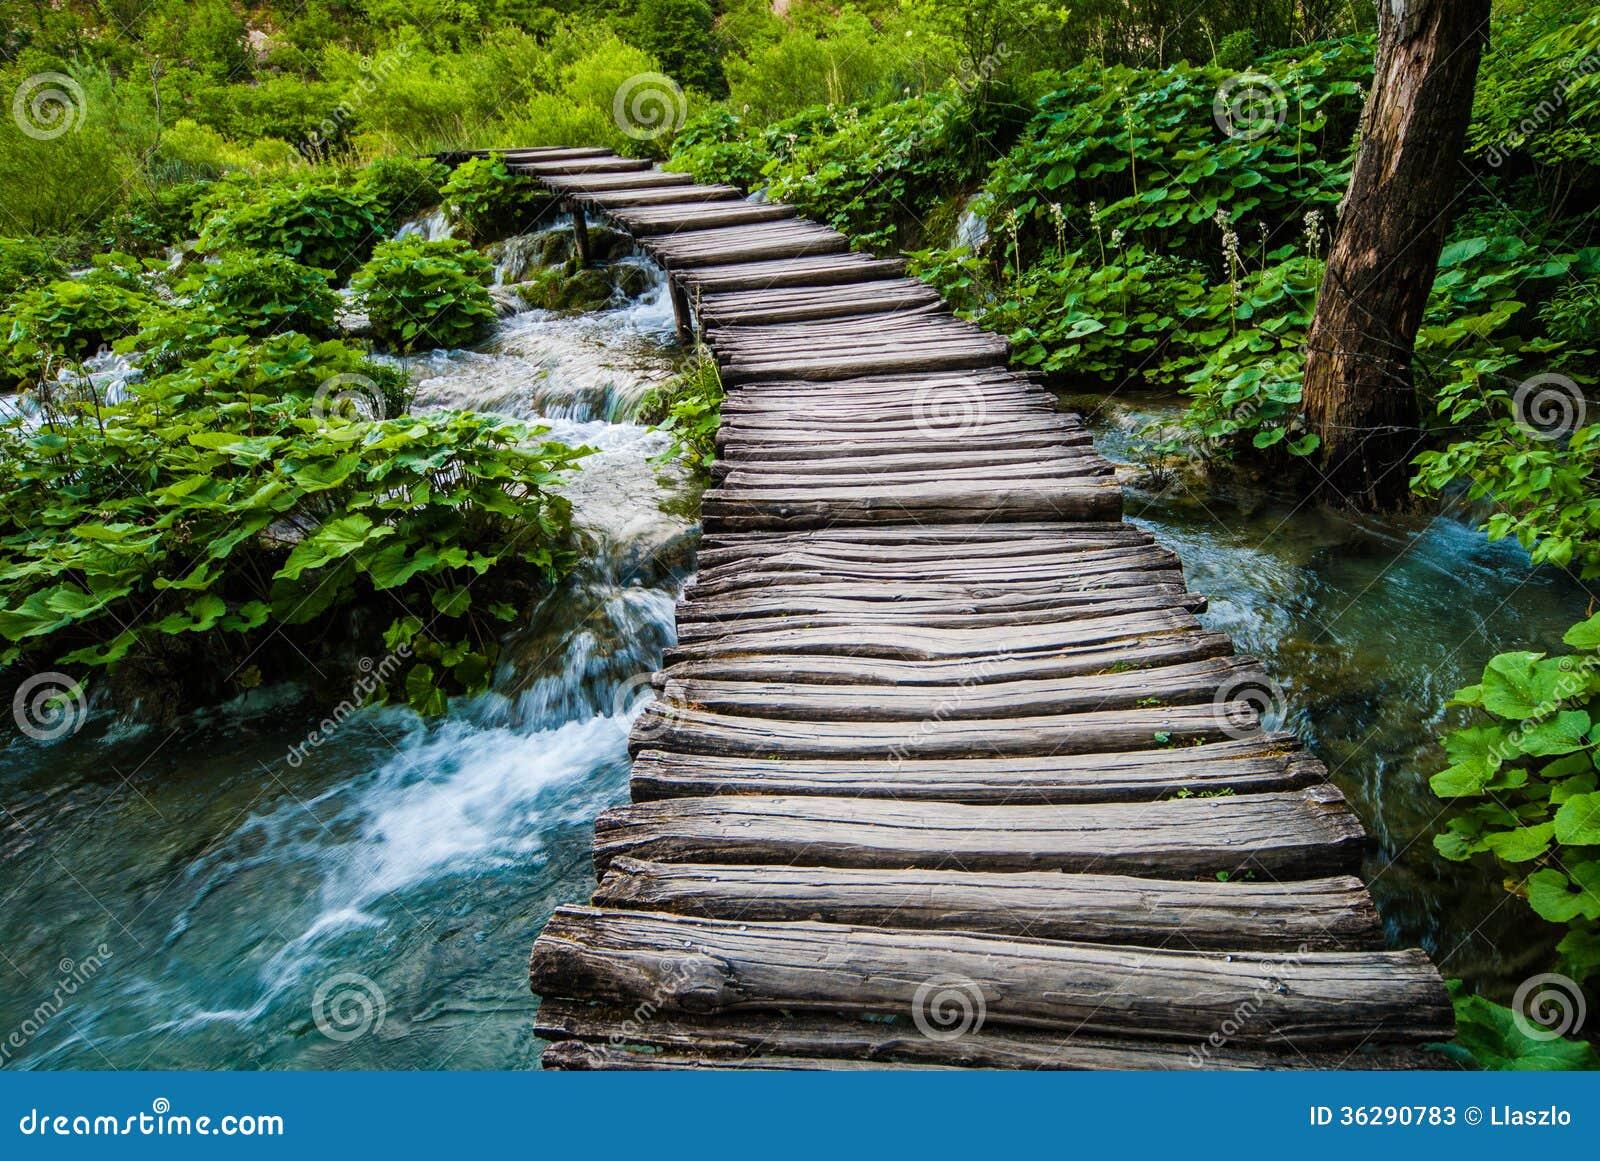 Old Wooden Bridge Over River Stock Image - Image of bridge ...